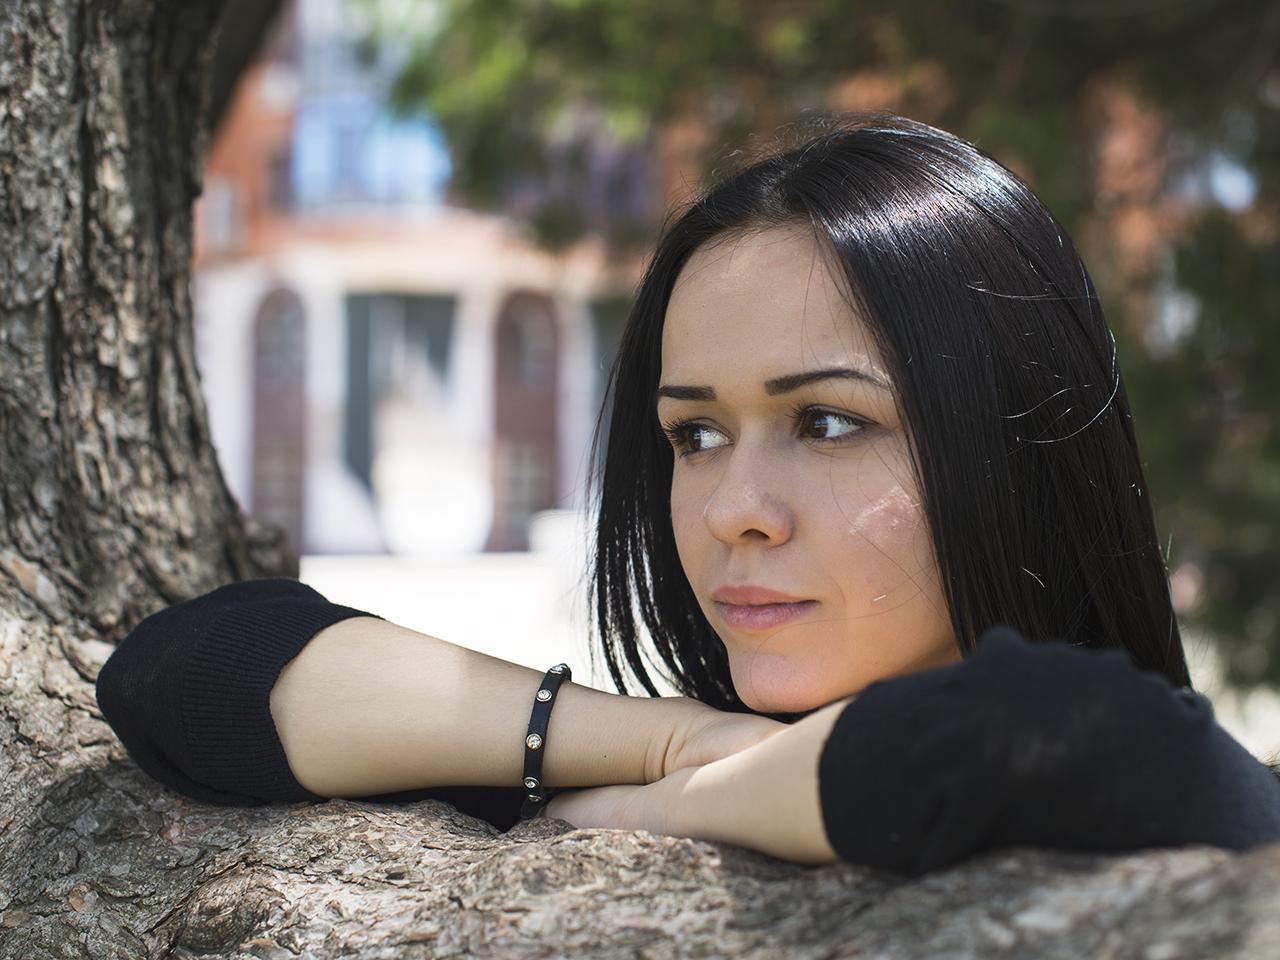 Работа девушке моделью азов предложение девушке на работе